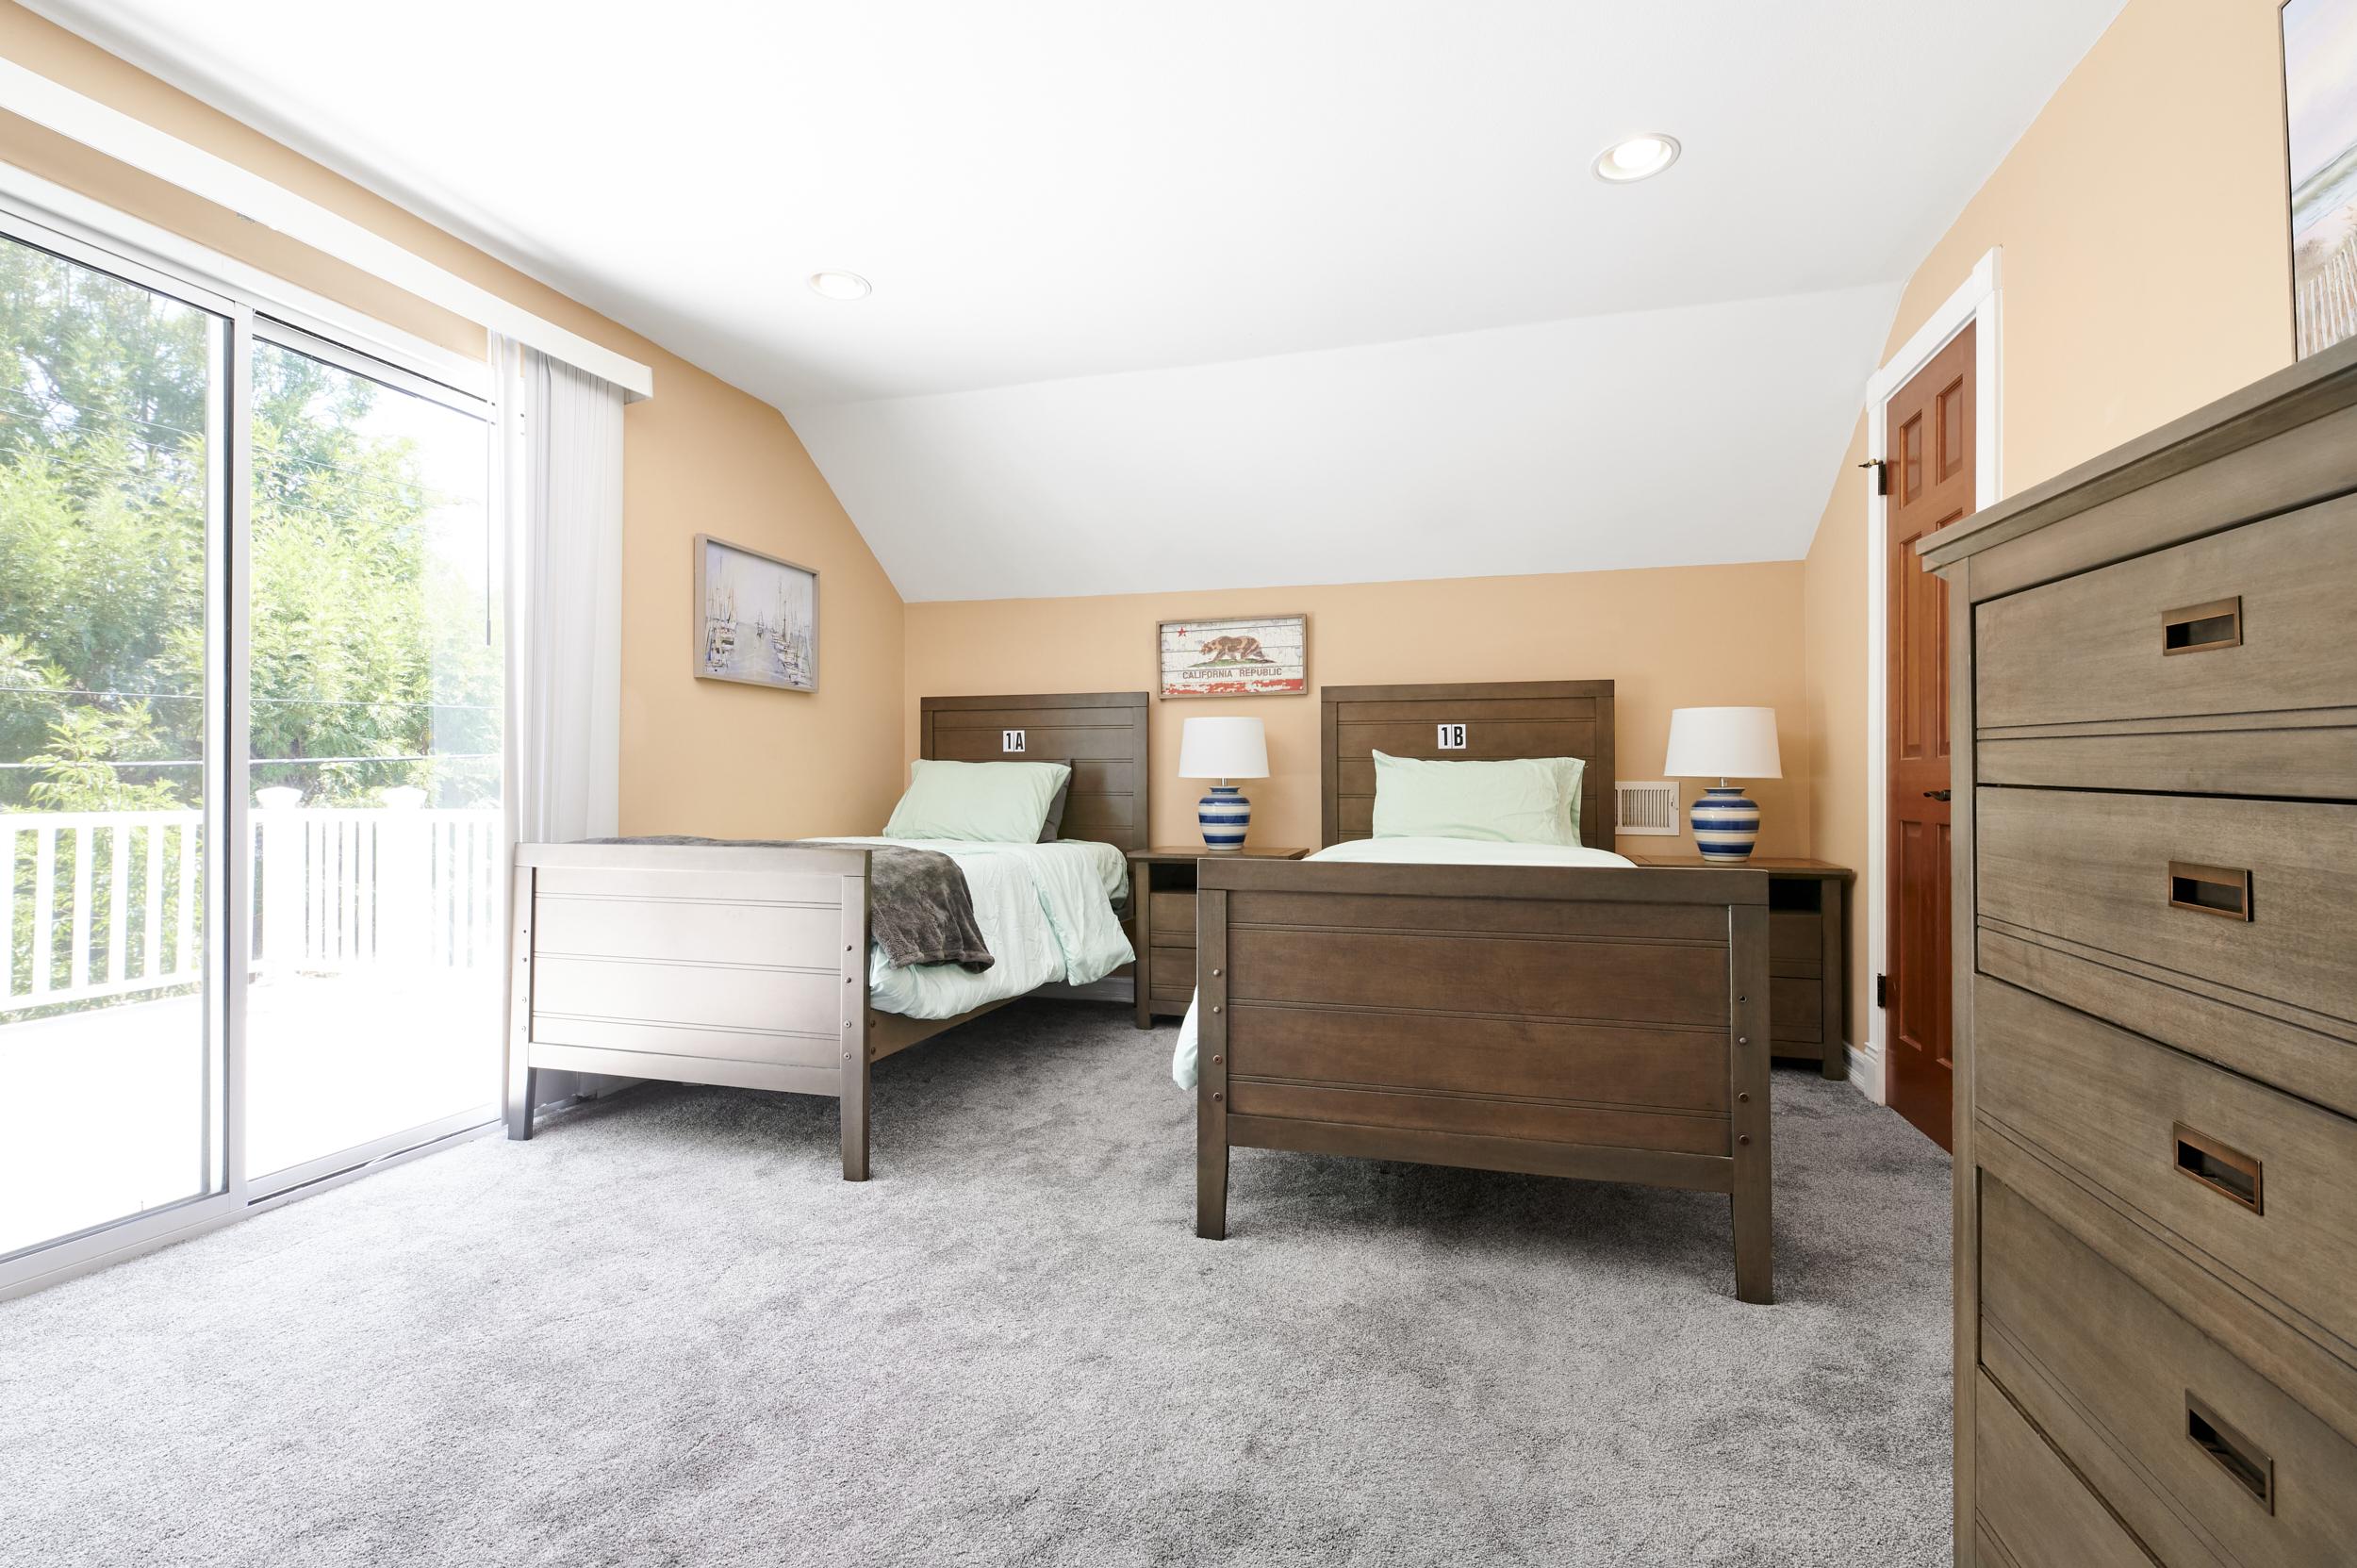 https://secureservercdn.net/198.71.233.107/zgw.2cd.myftpupload.com/wp-content/uploads/2020/08/Gratitude-Lodge-Newport-Beach-2nd-Upstairs-Bedroom-with-Balcony.jpg?time=1607134972